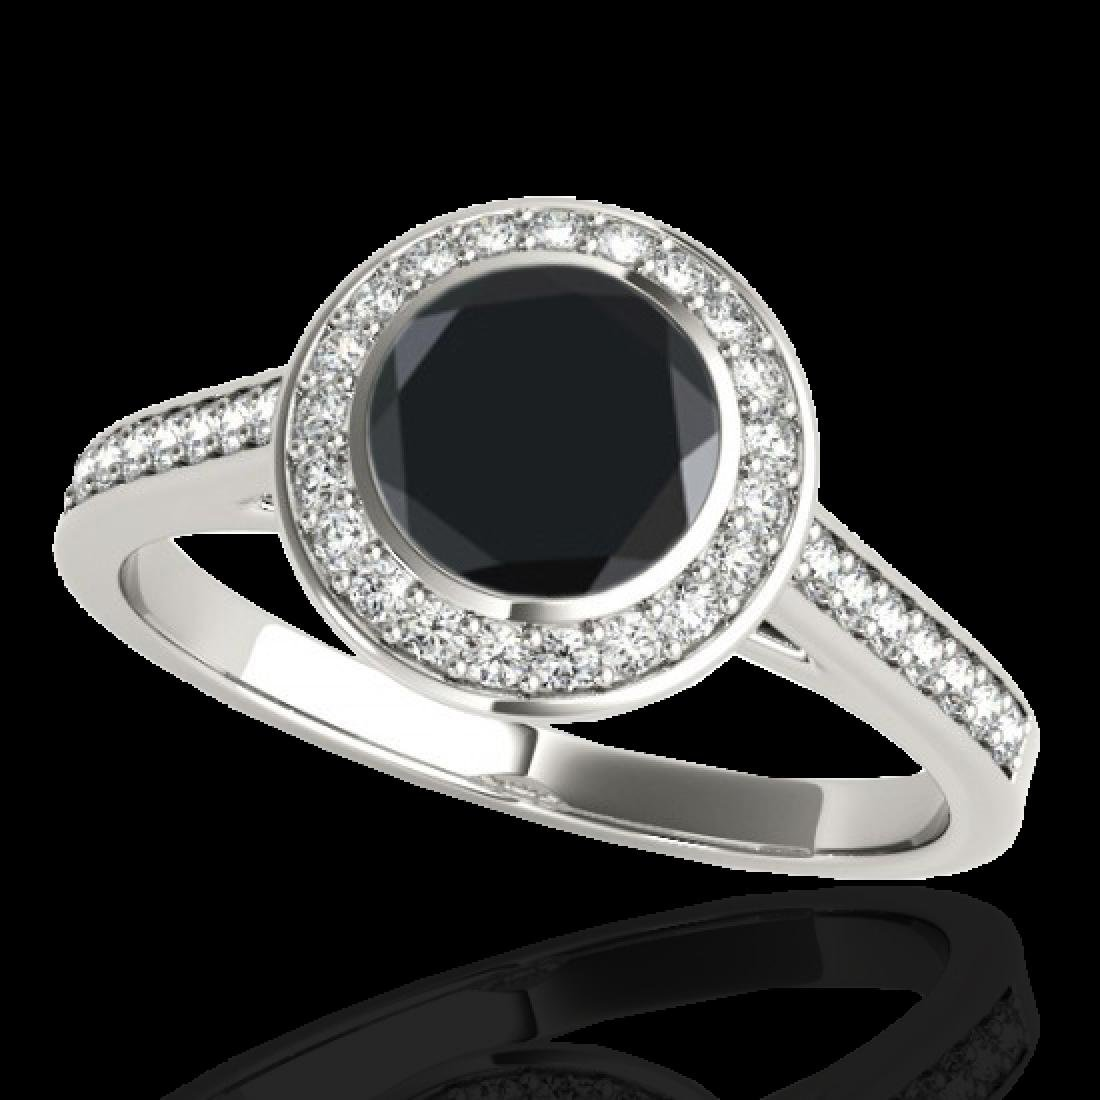 1.3 CTW Certified VS Black Diamond Solitaire Halo Ring - 2